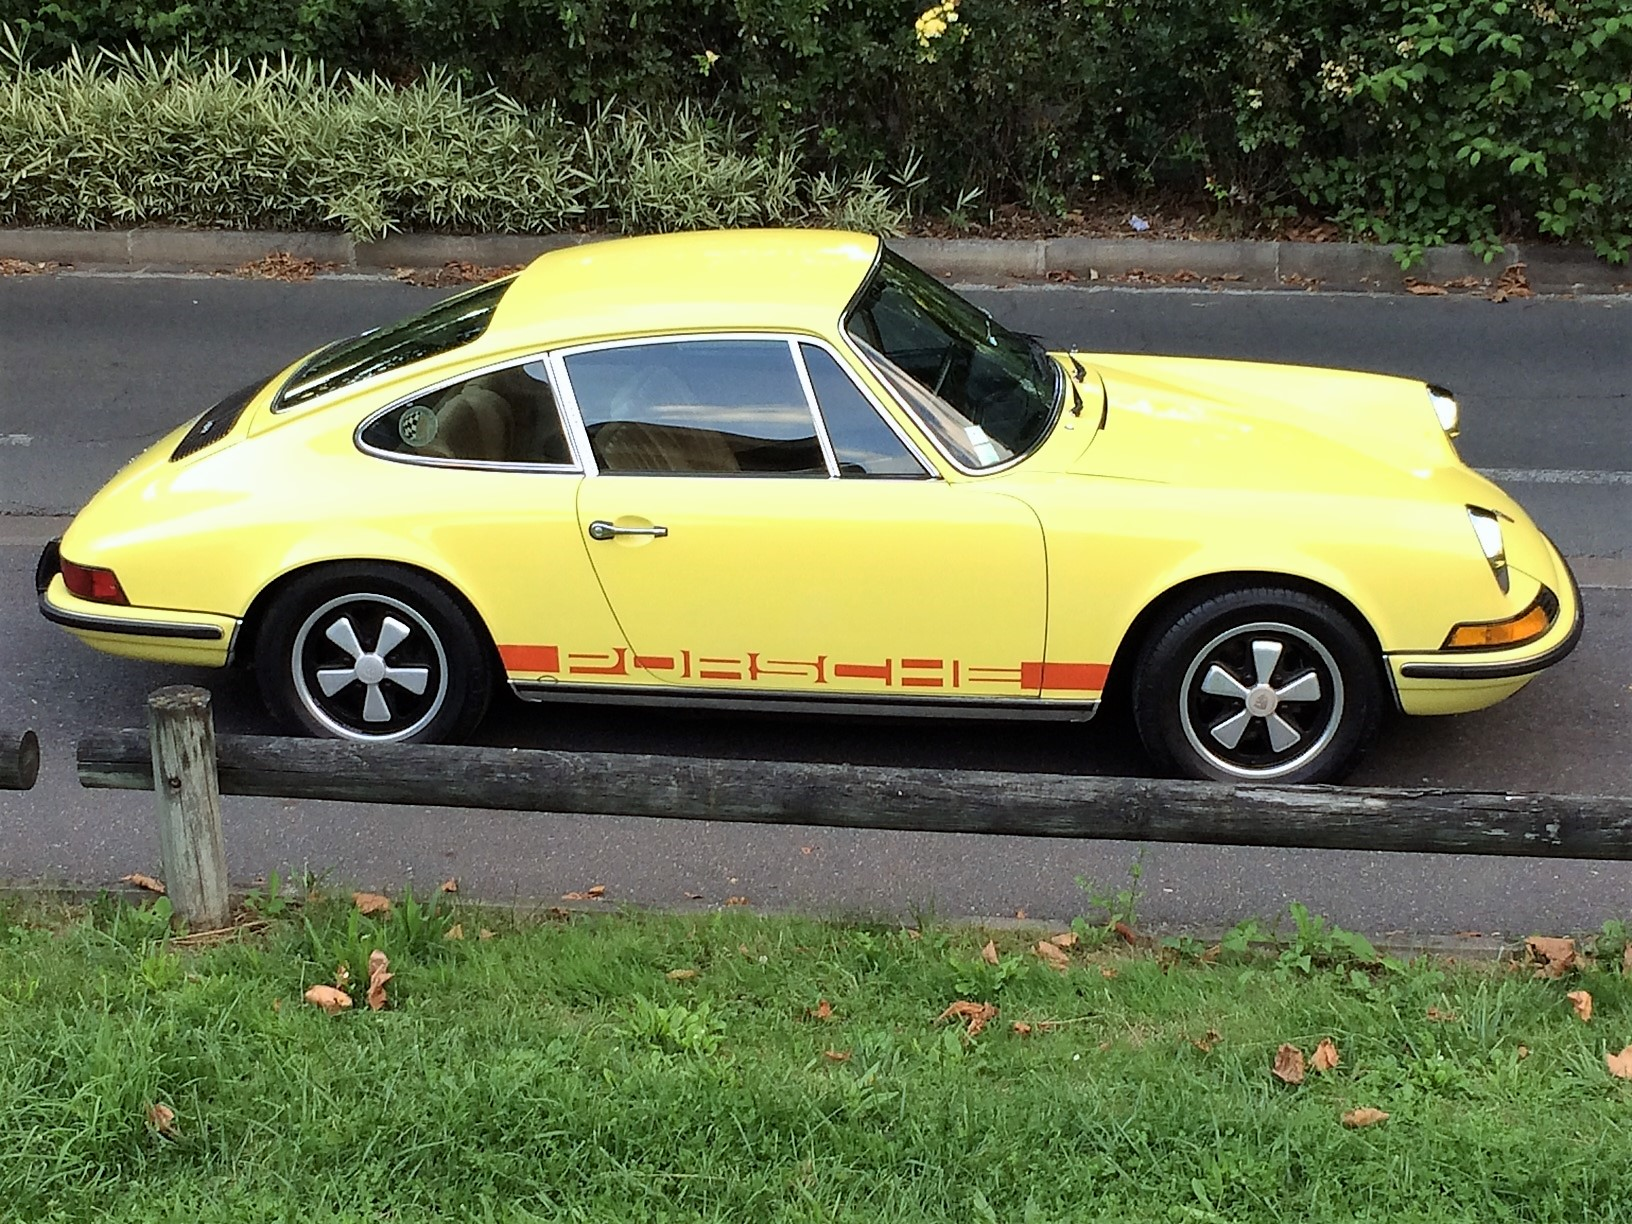 Porsche9112.4TE197305311.JPG